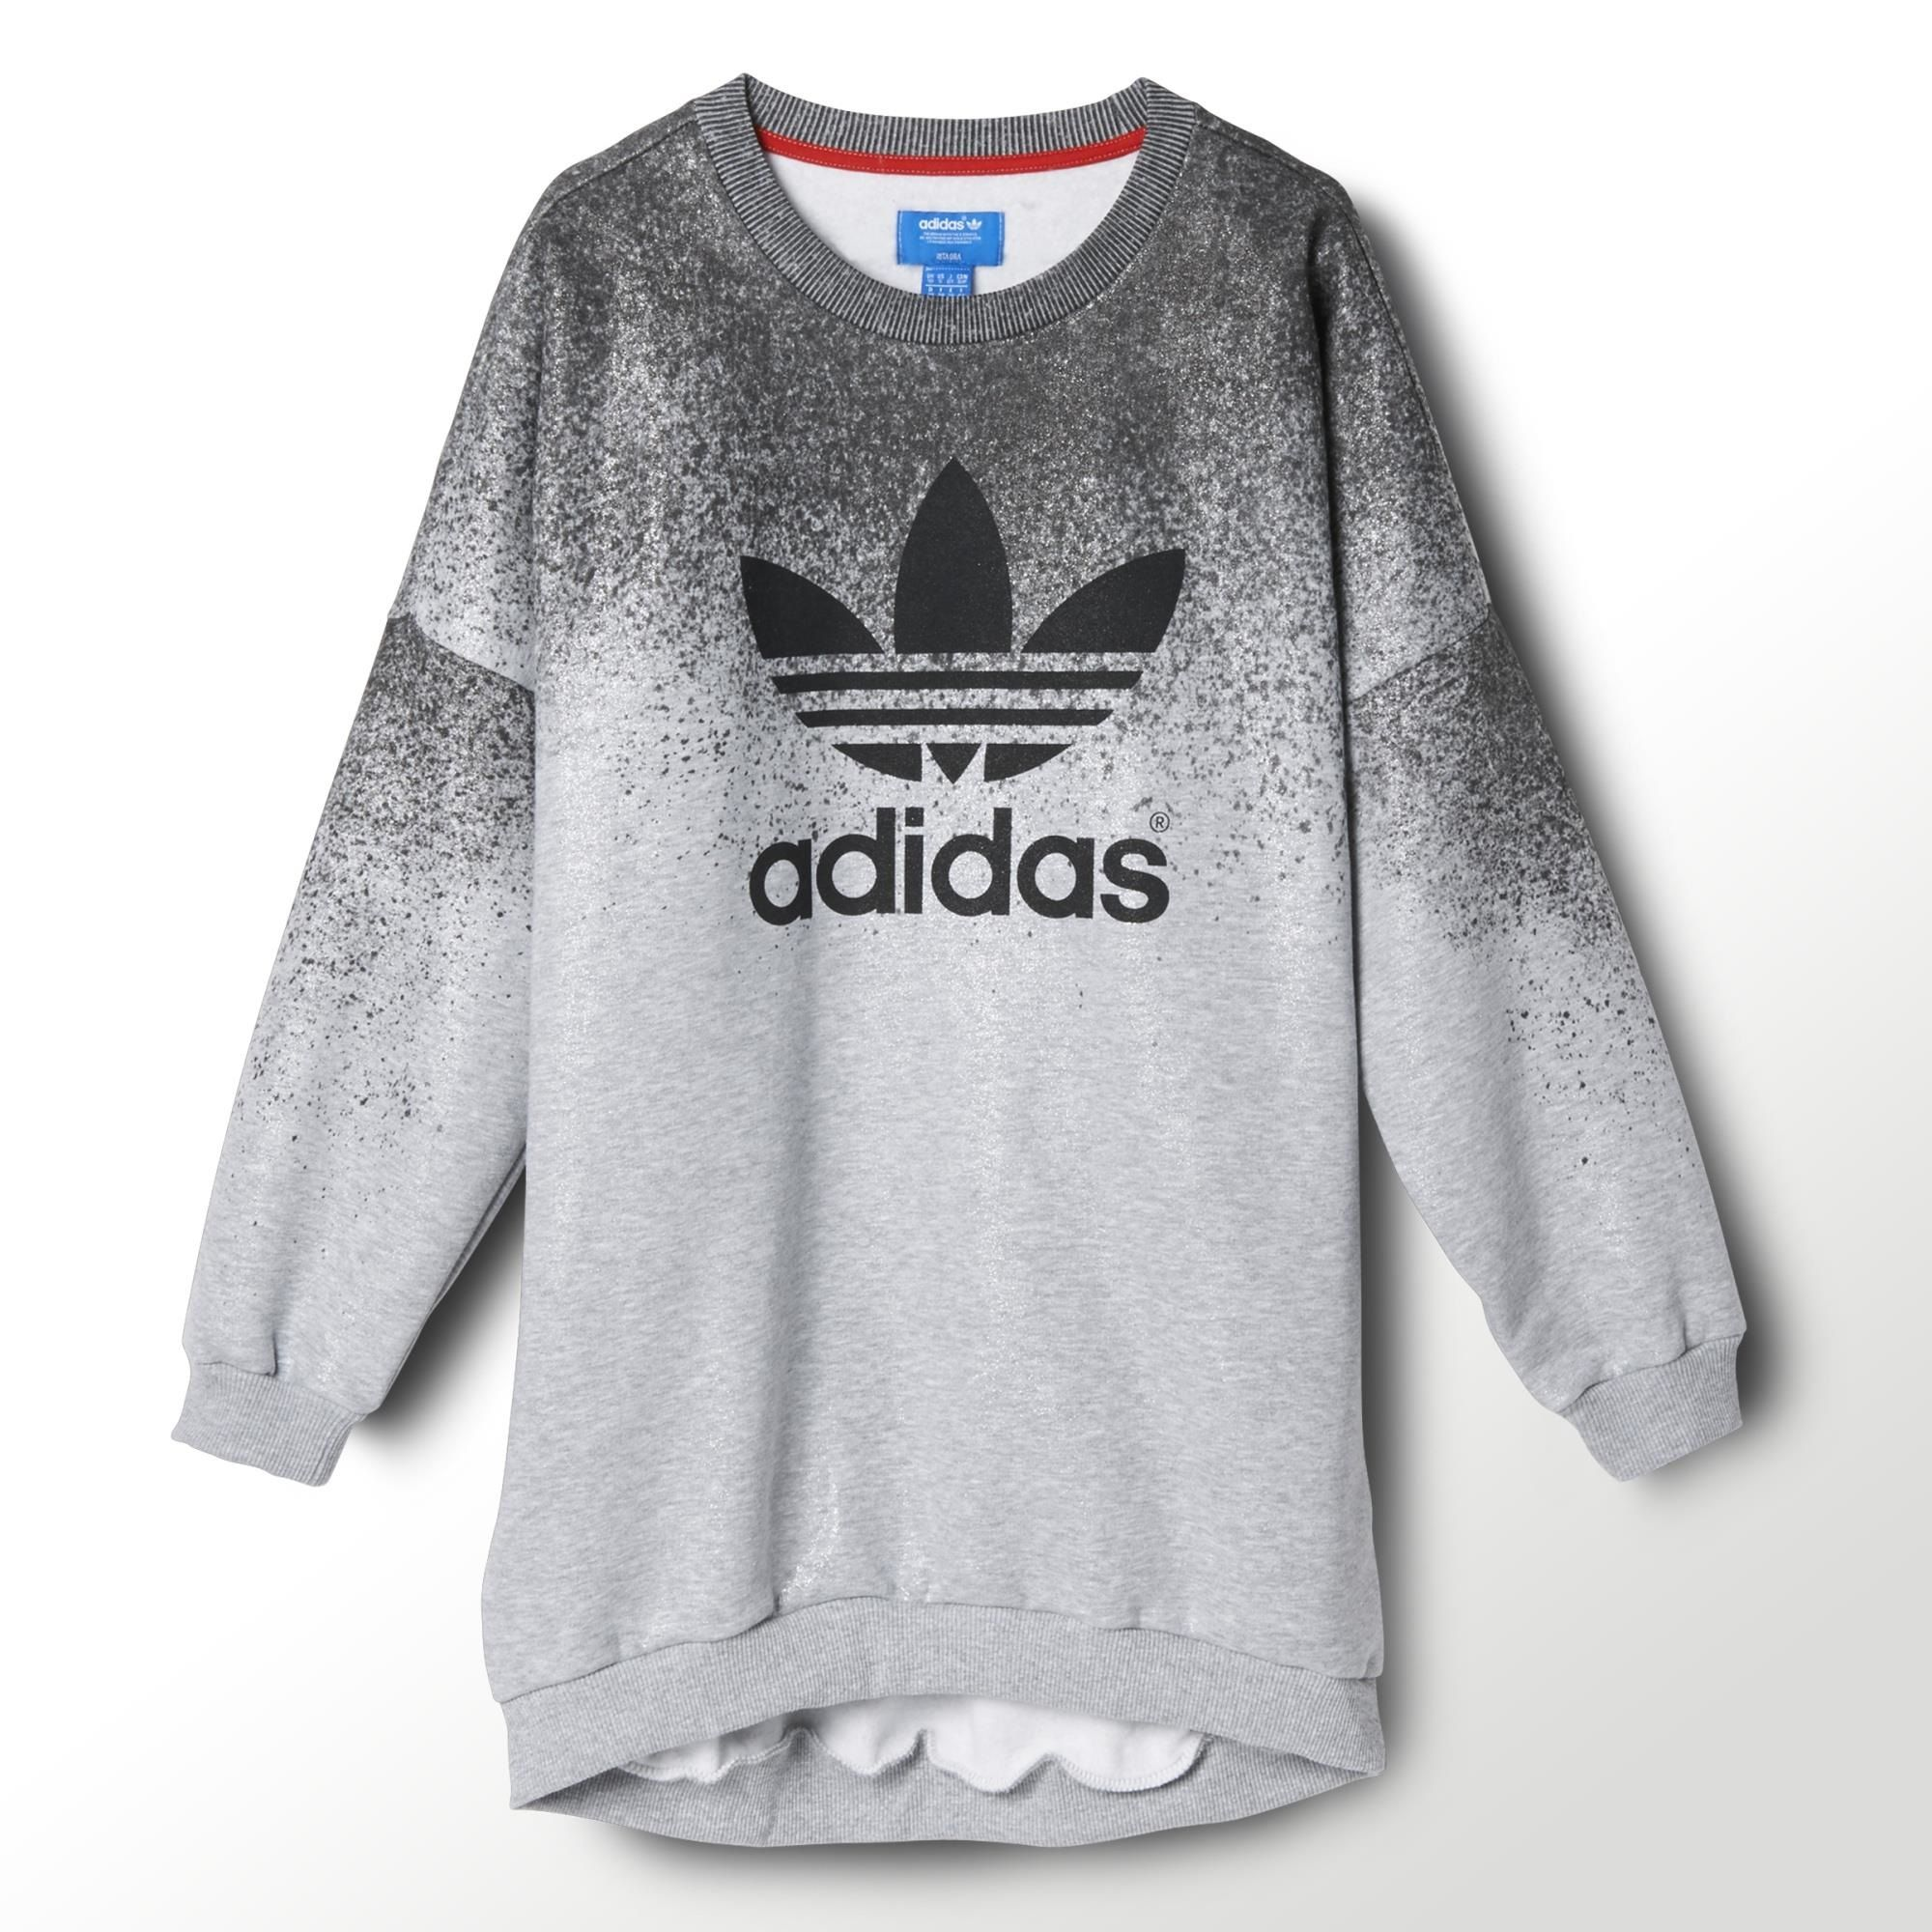 adidas Rita Ora Sweatshirt Dress | adidas US